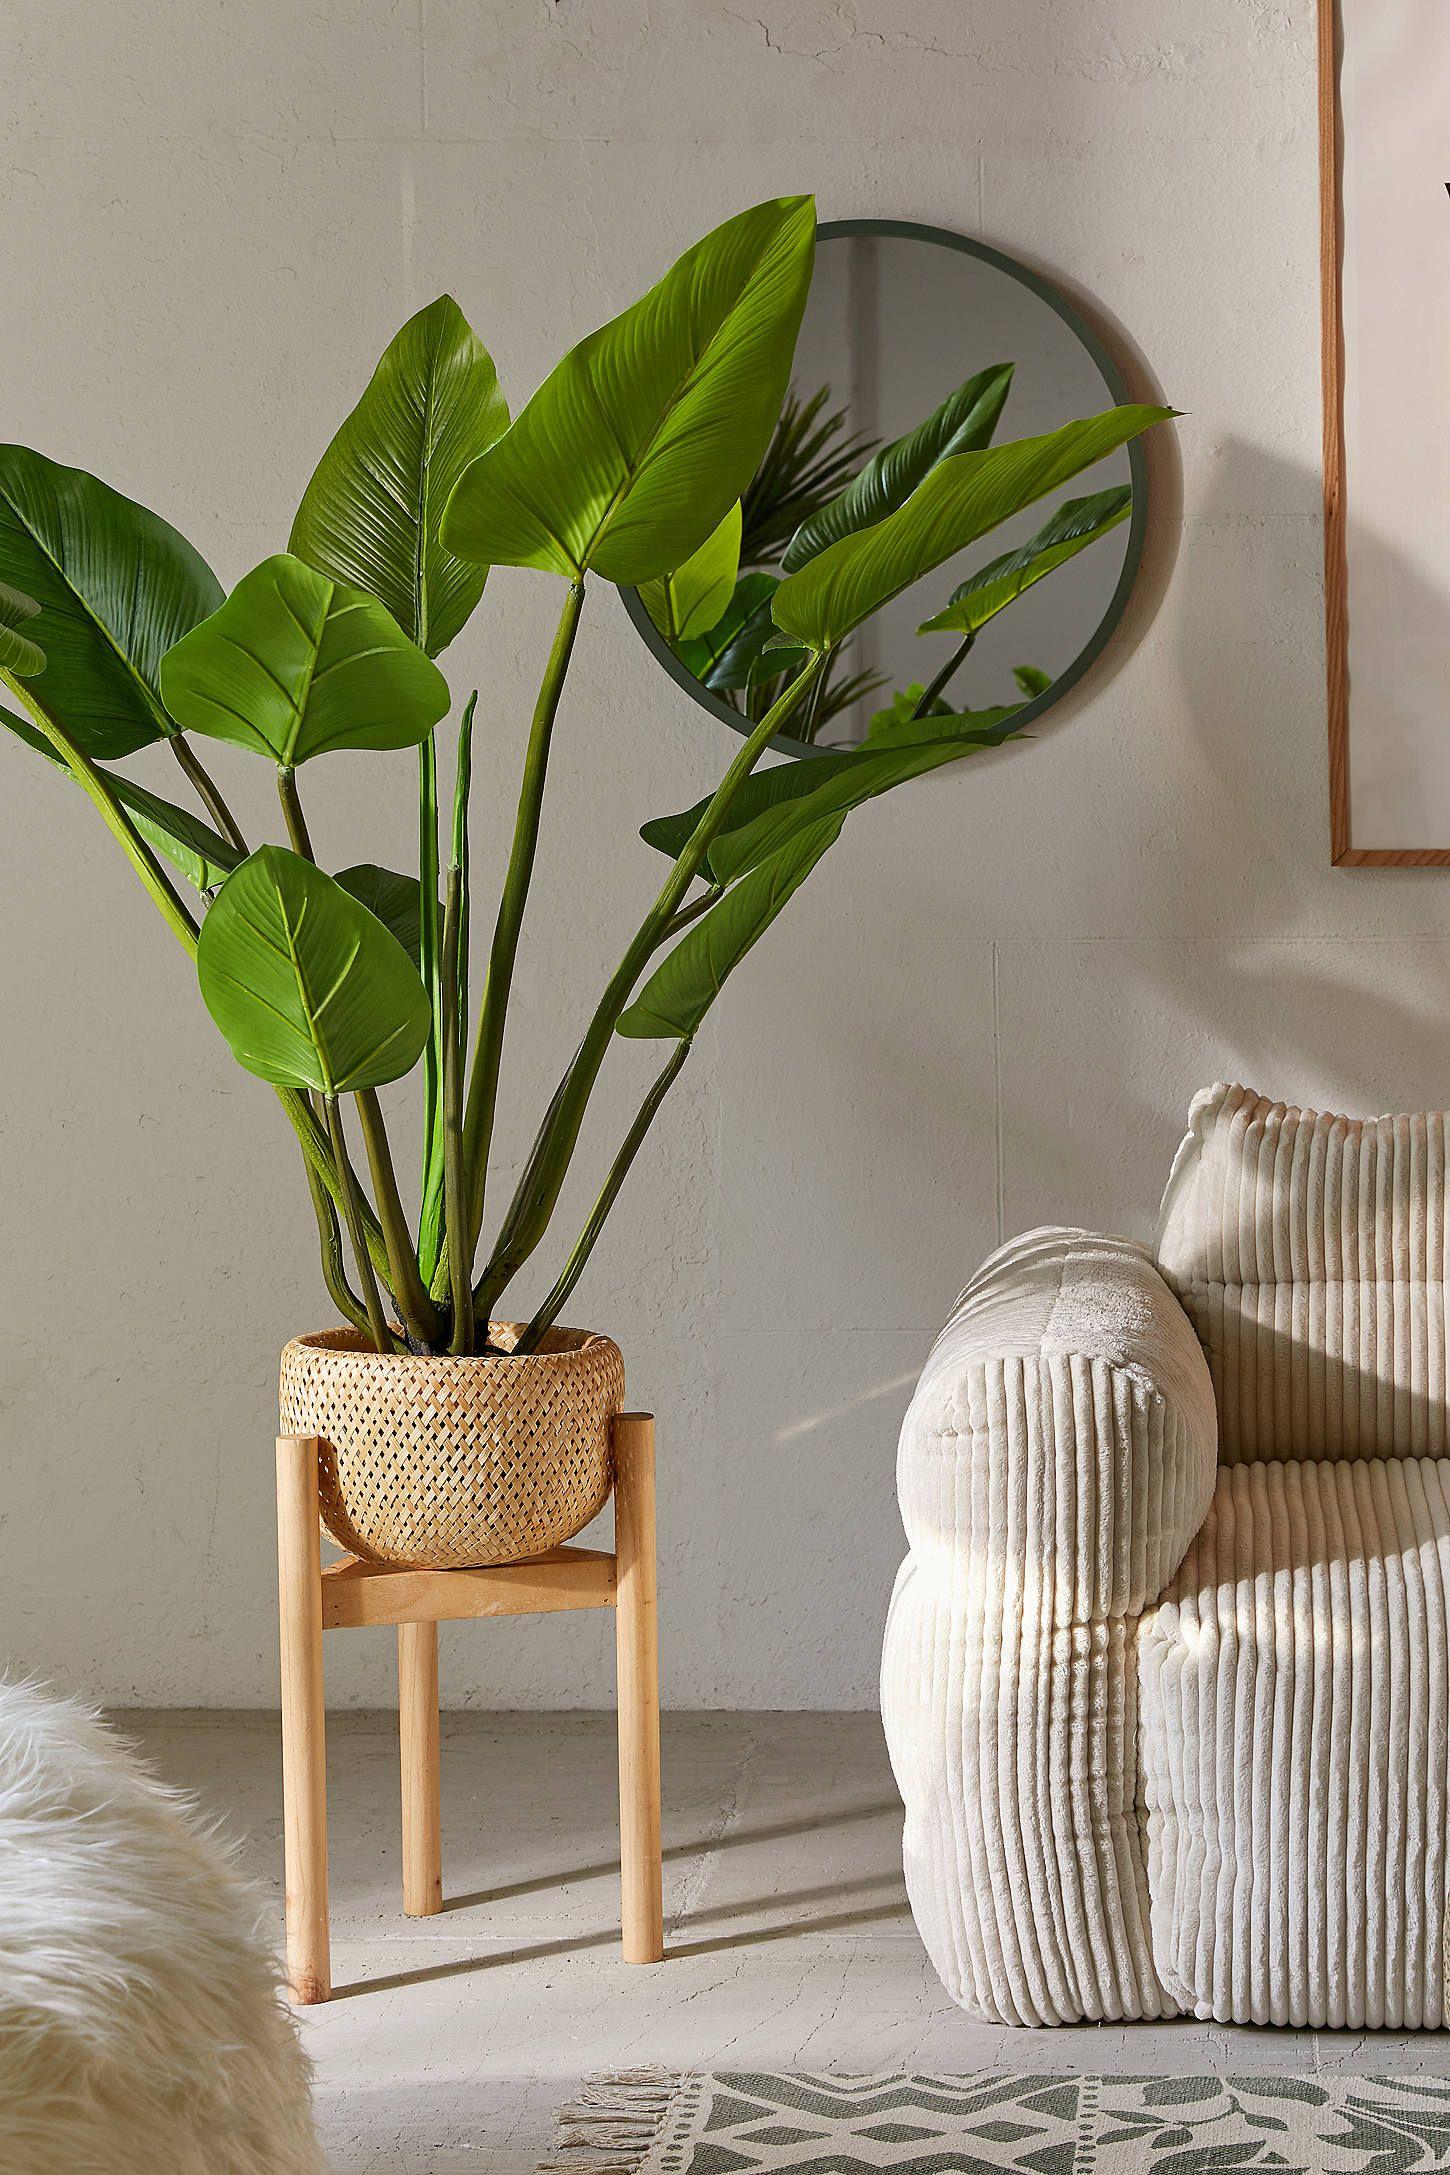 Eva Curcuma Potted Faux Tree Plant Decor Indoor Houseplants Decor Plant Decor